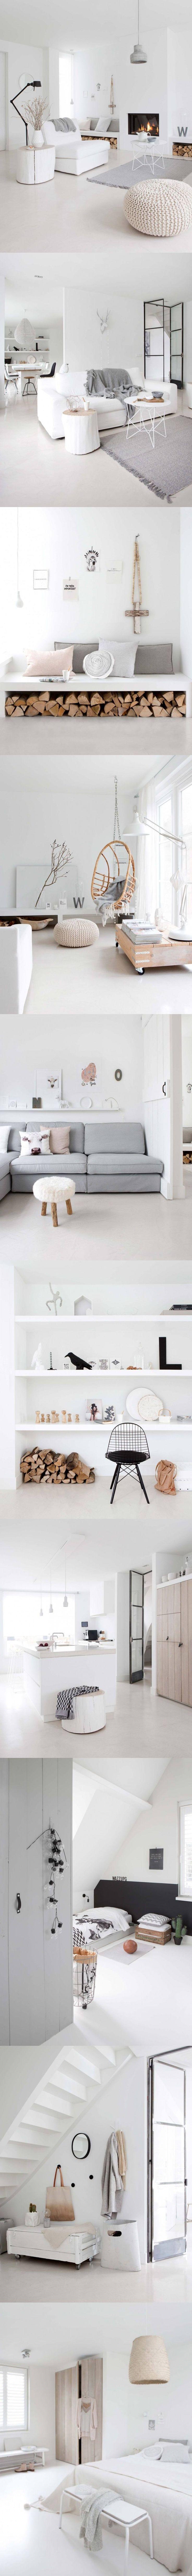 Tips para lograr un diseño nórdico / http://basillicana.tumblr.com